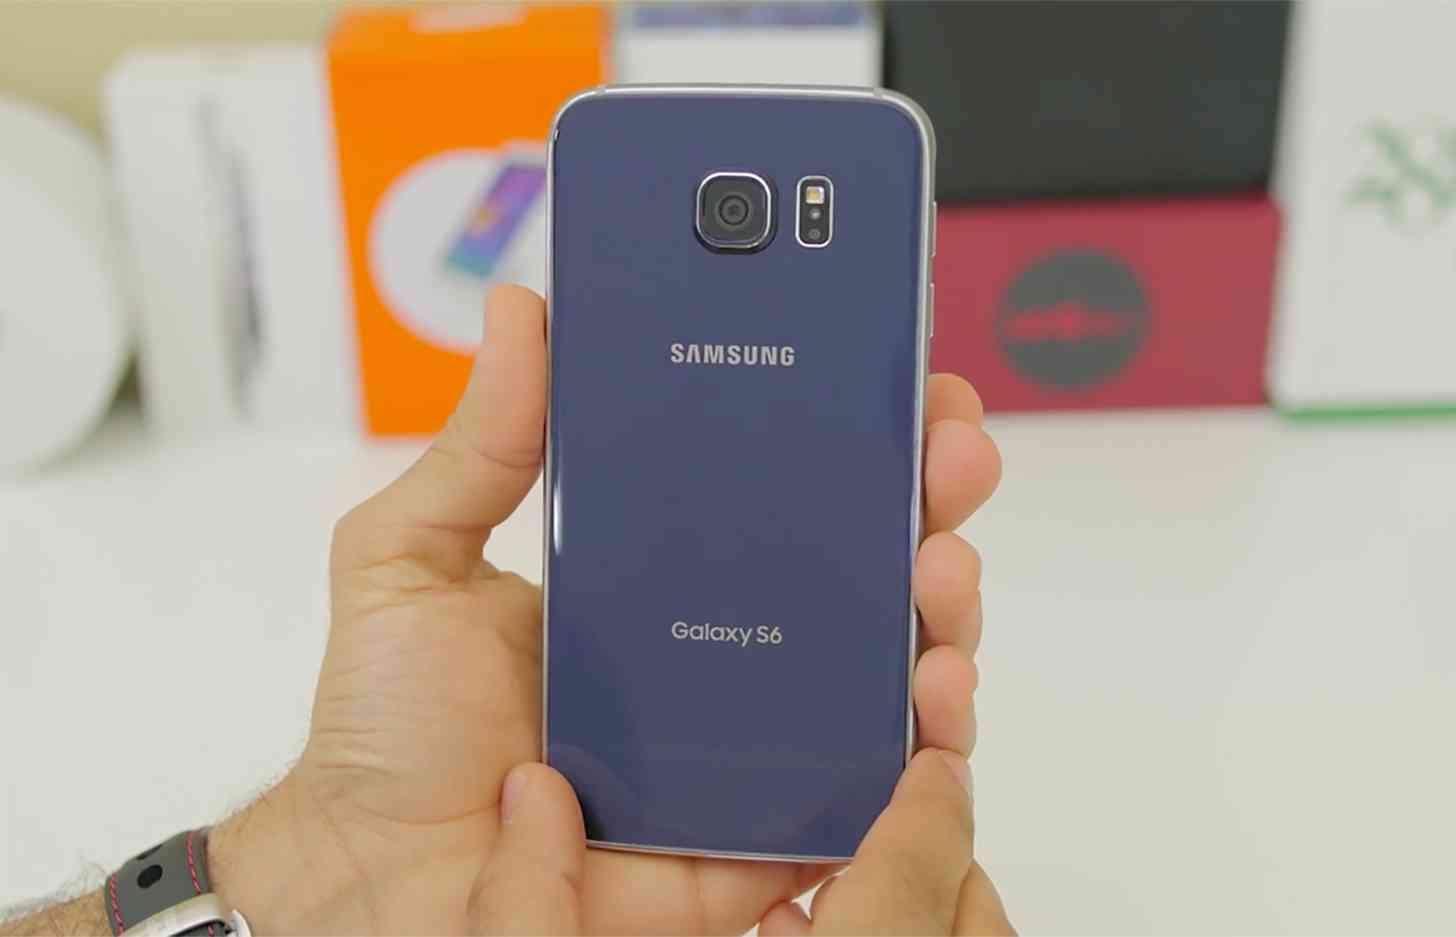 Samsung Galaxy S6 rear large